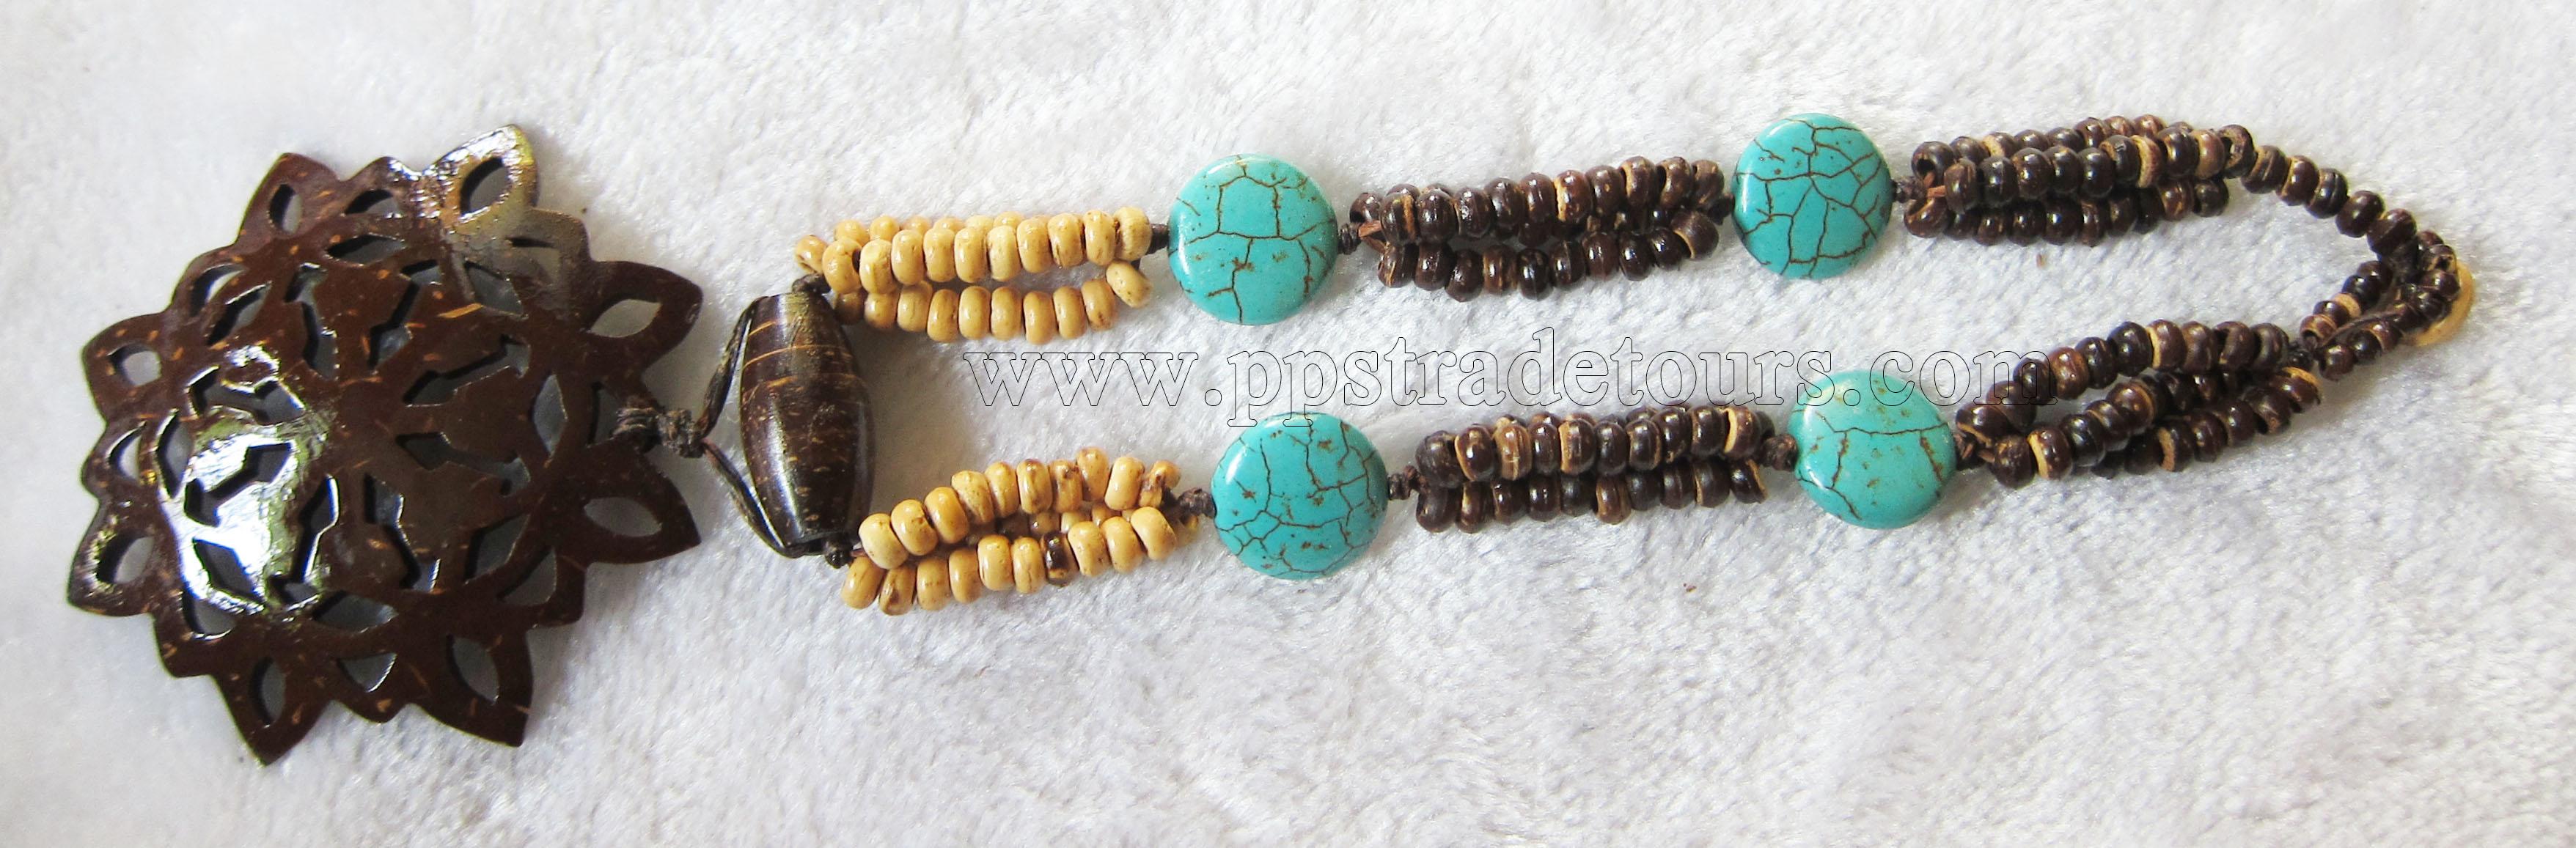 Coconut bead necklace_2636